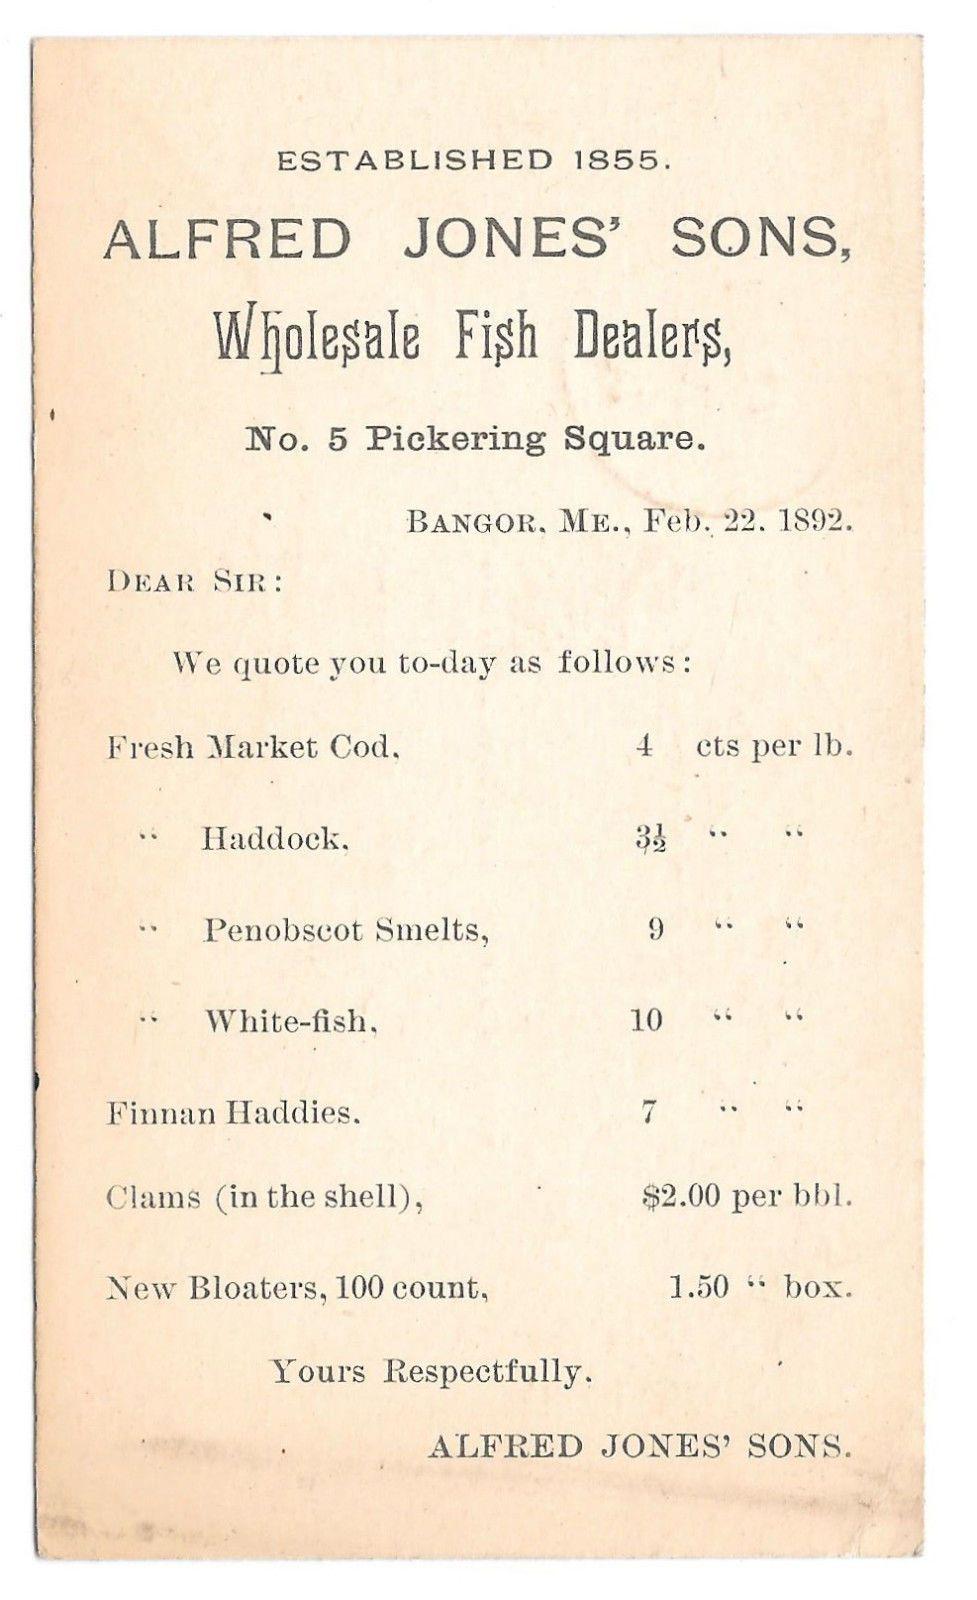 Alfred Jones' Sons, Wholesale Fish Dealers, Bangor, Maine